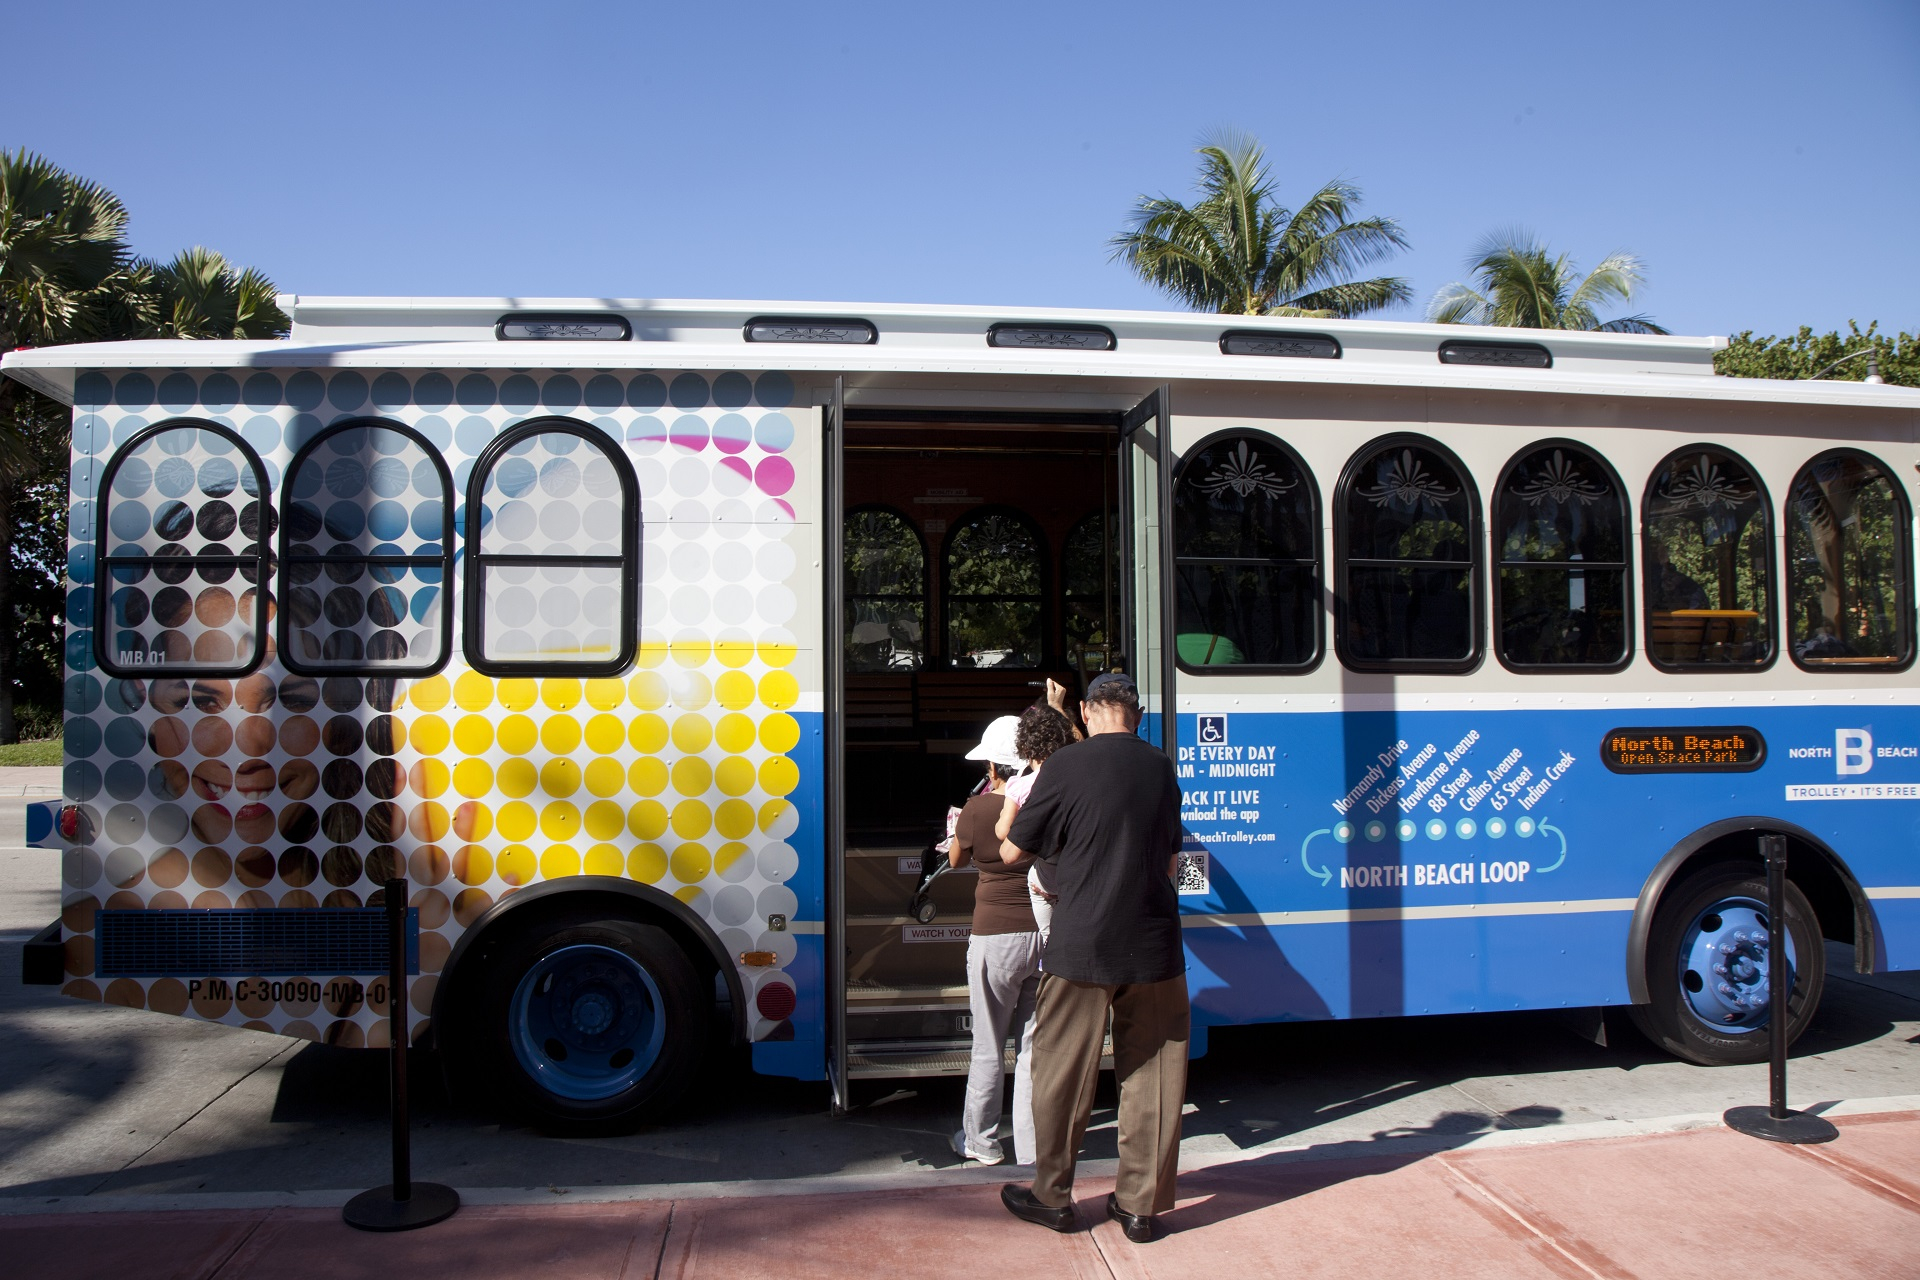 Trolley & Circulator Transportation Services